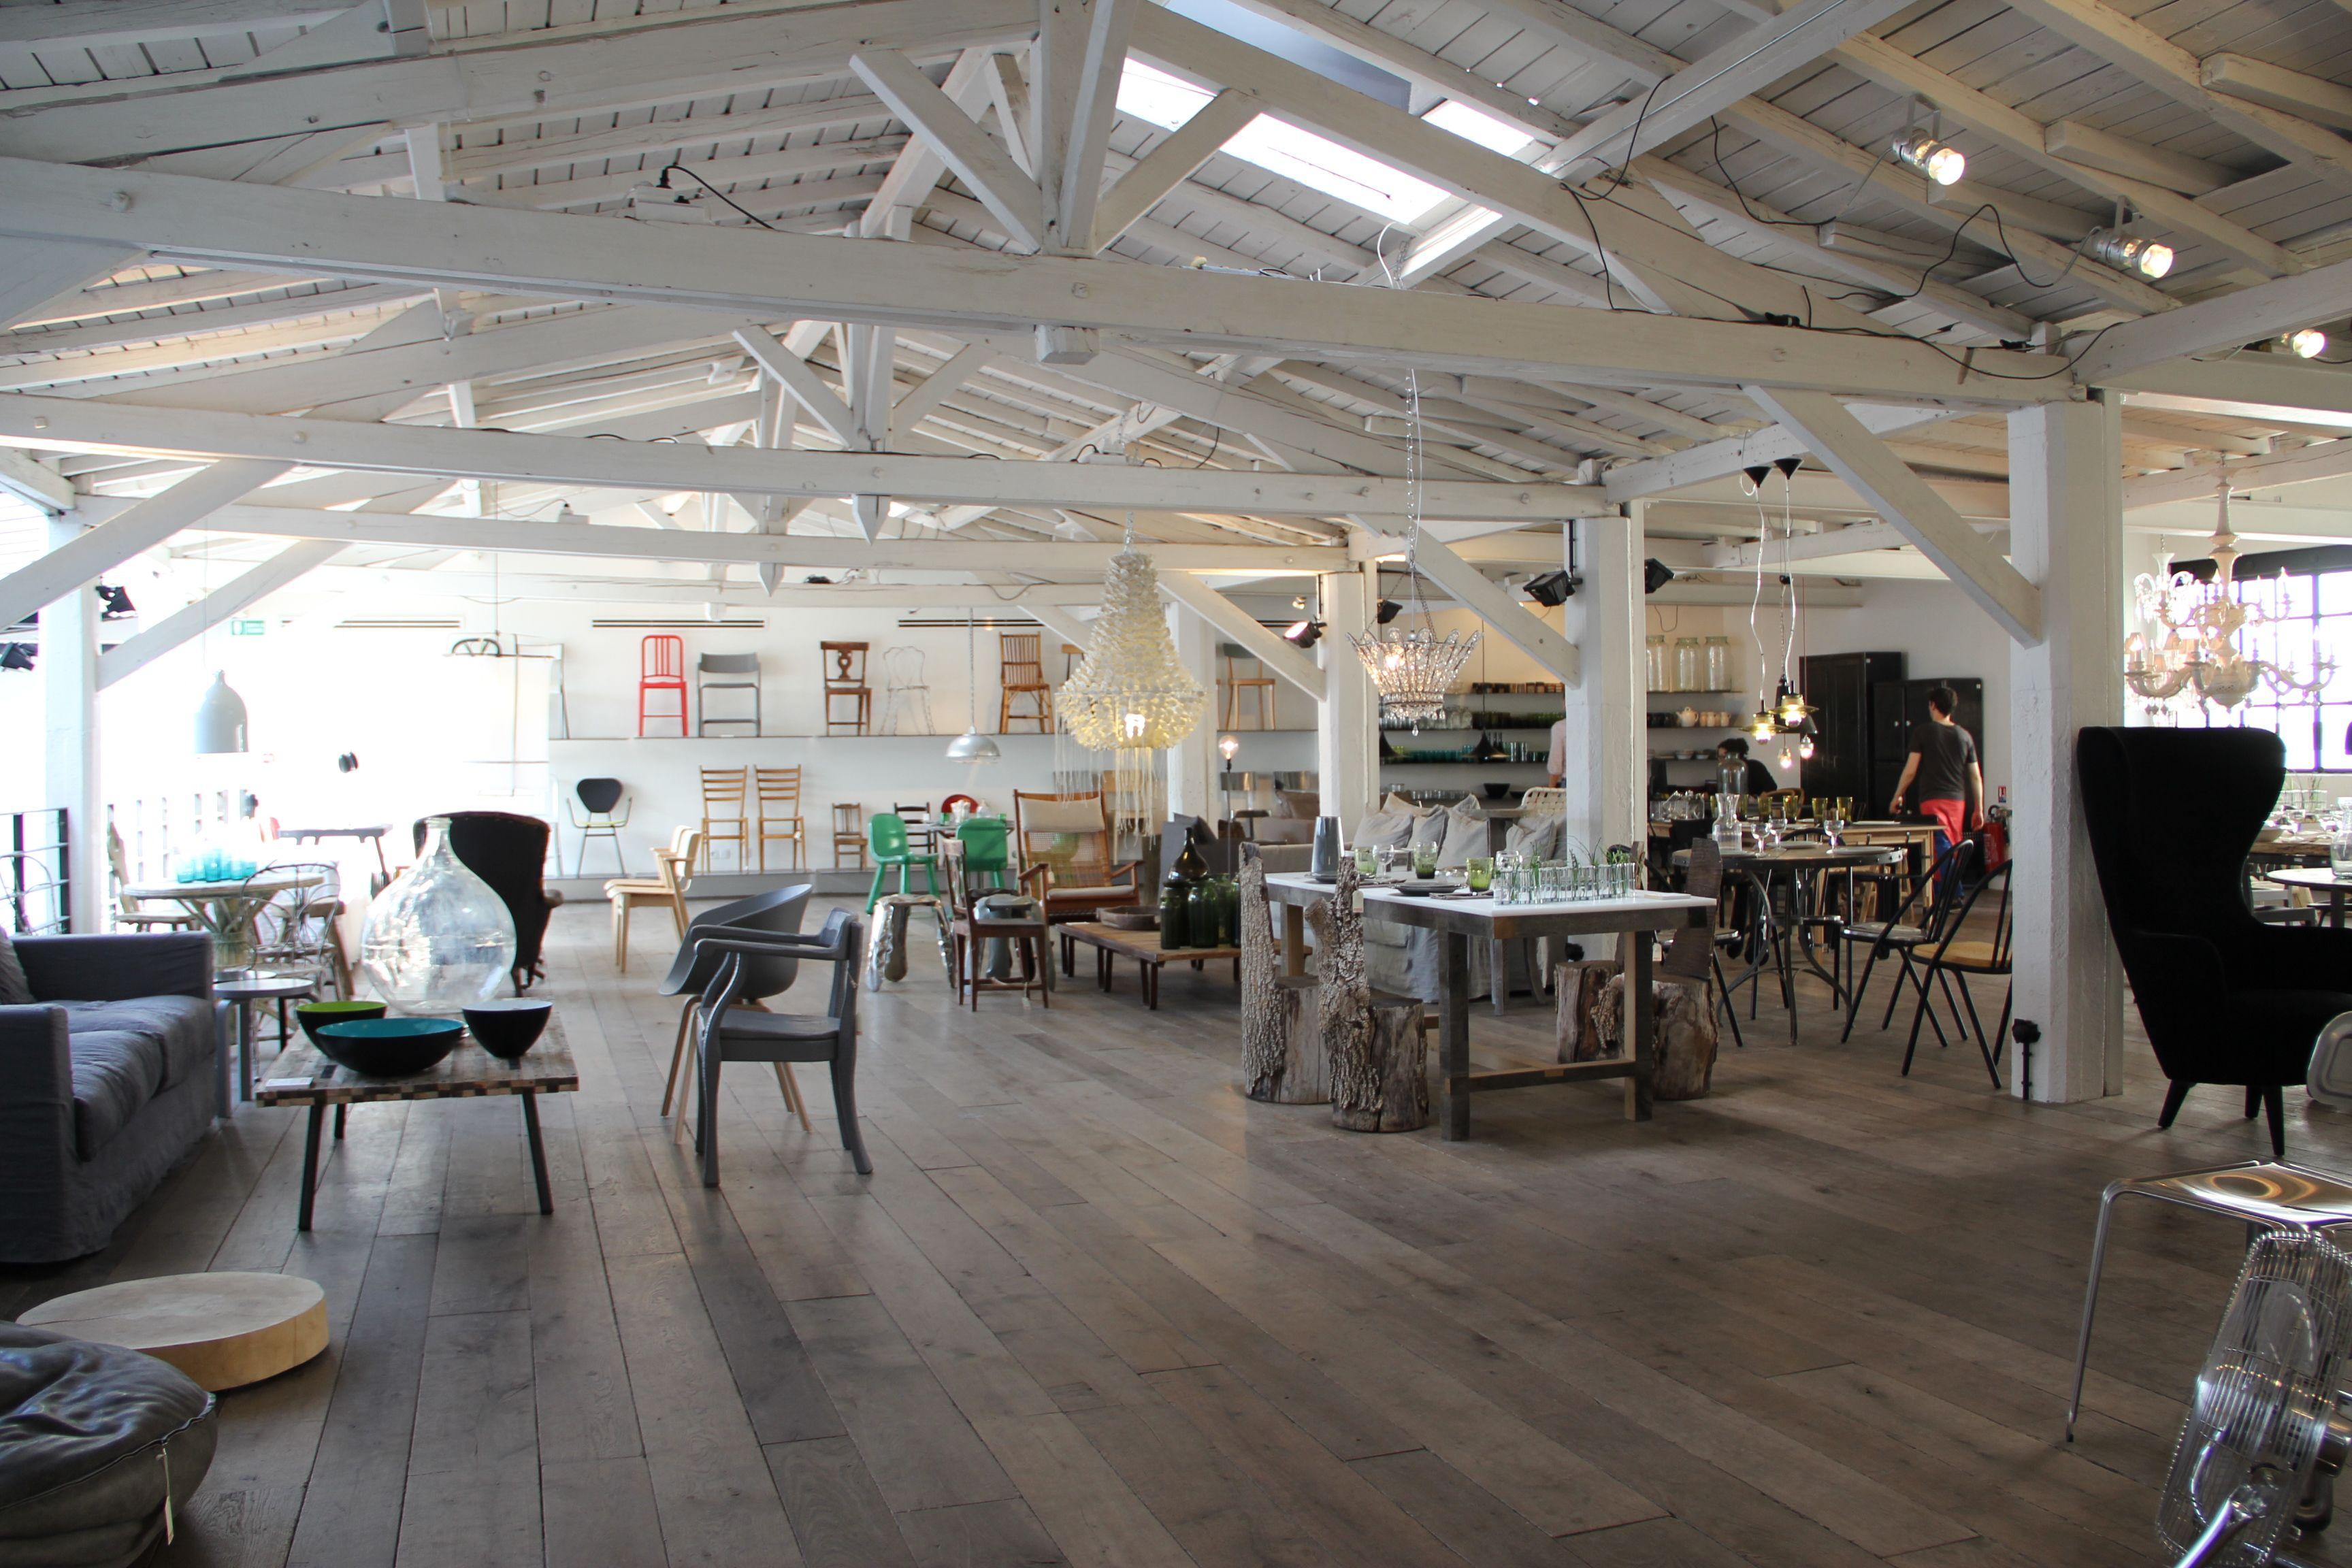 Furniture Shop Industrial Style   Tìm Với Google